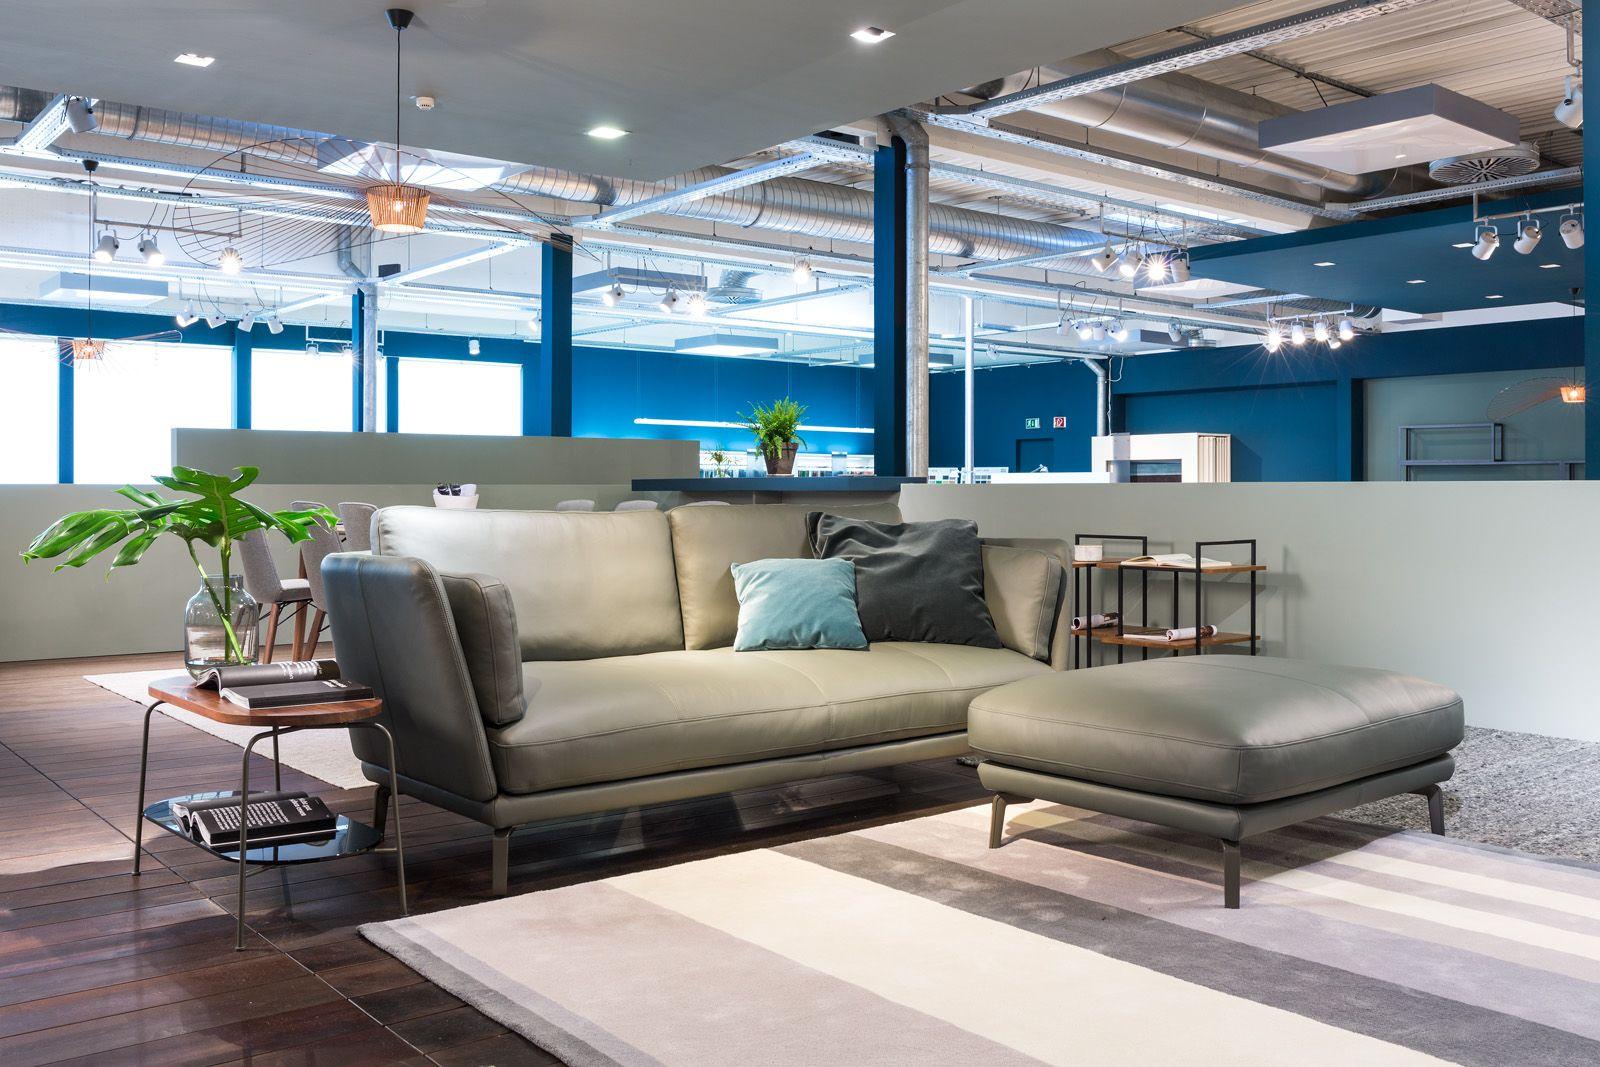 comfortable rolf benz sofa. Rolf Benz RONDO Sofas #sofas #rolfbenz #Rondo #comfort #design #comfortable #luxuryfurniture #luxurydesign #newcollection #moderndesign #interiordesign Comfortable Sofa _